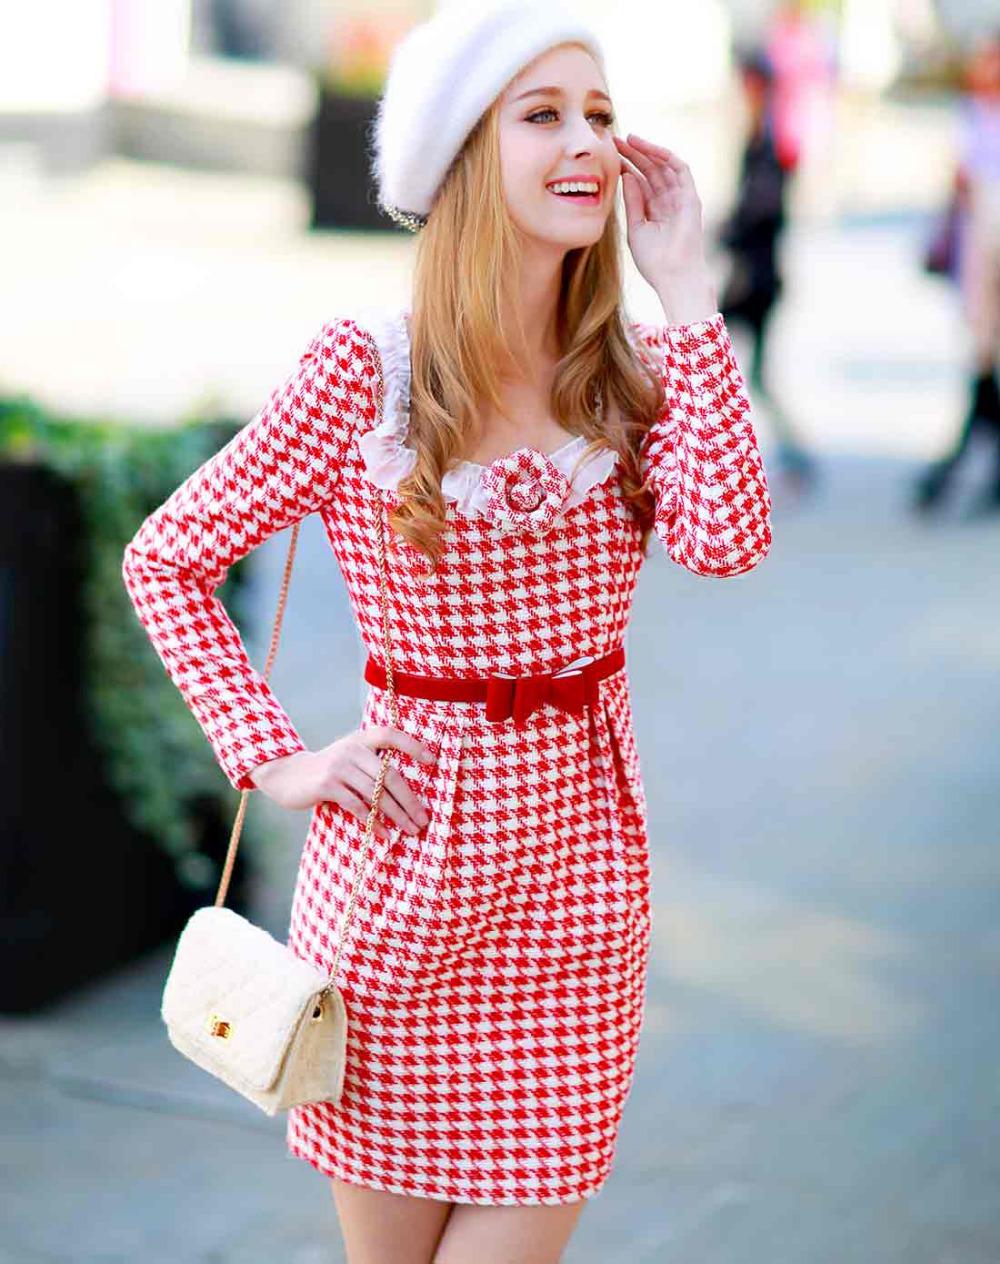 Original Fashion 2016 Brand Autumn and Winter Robe Woolen Dress Red Plaid Plus Size Slim Elegant Women Dresses Vestido Wholesale